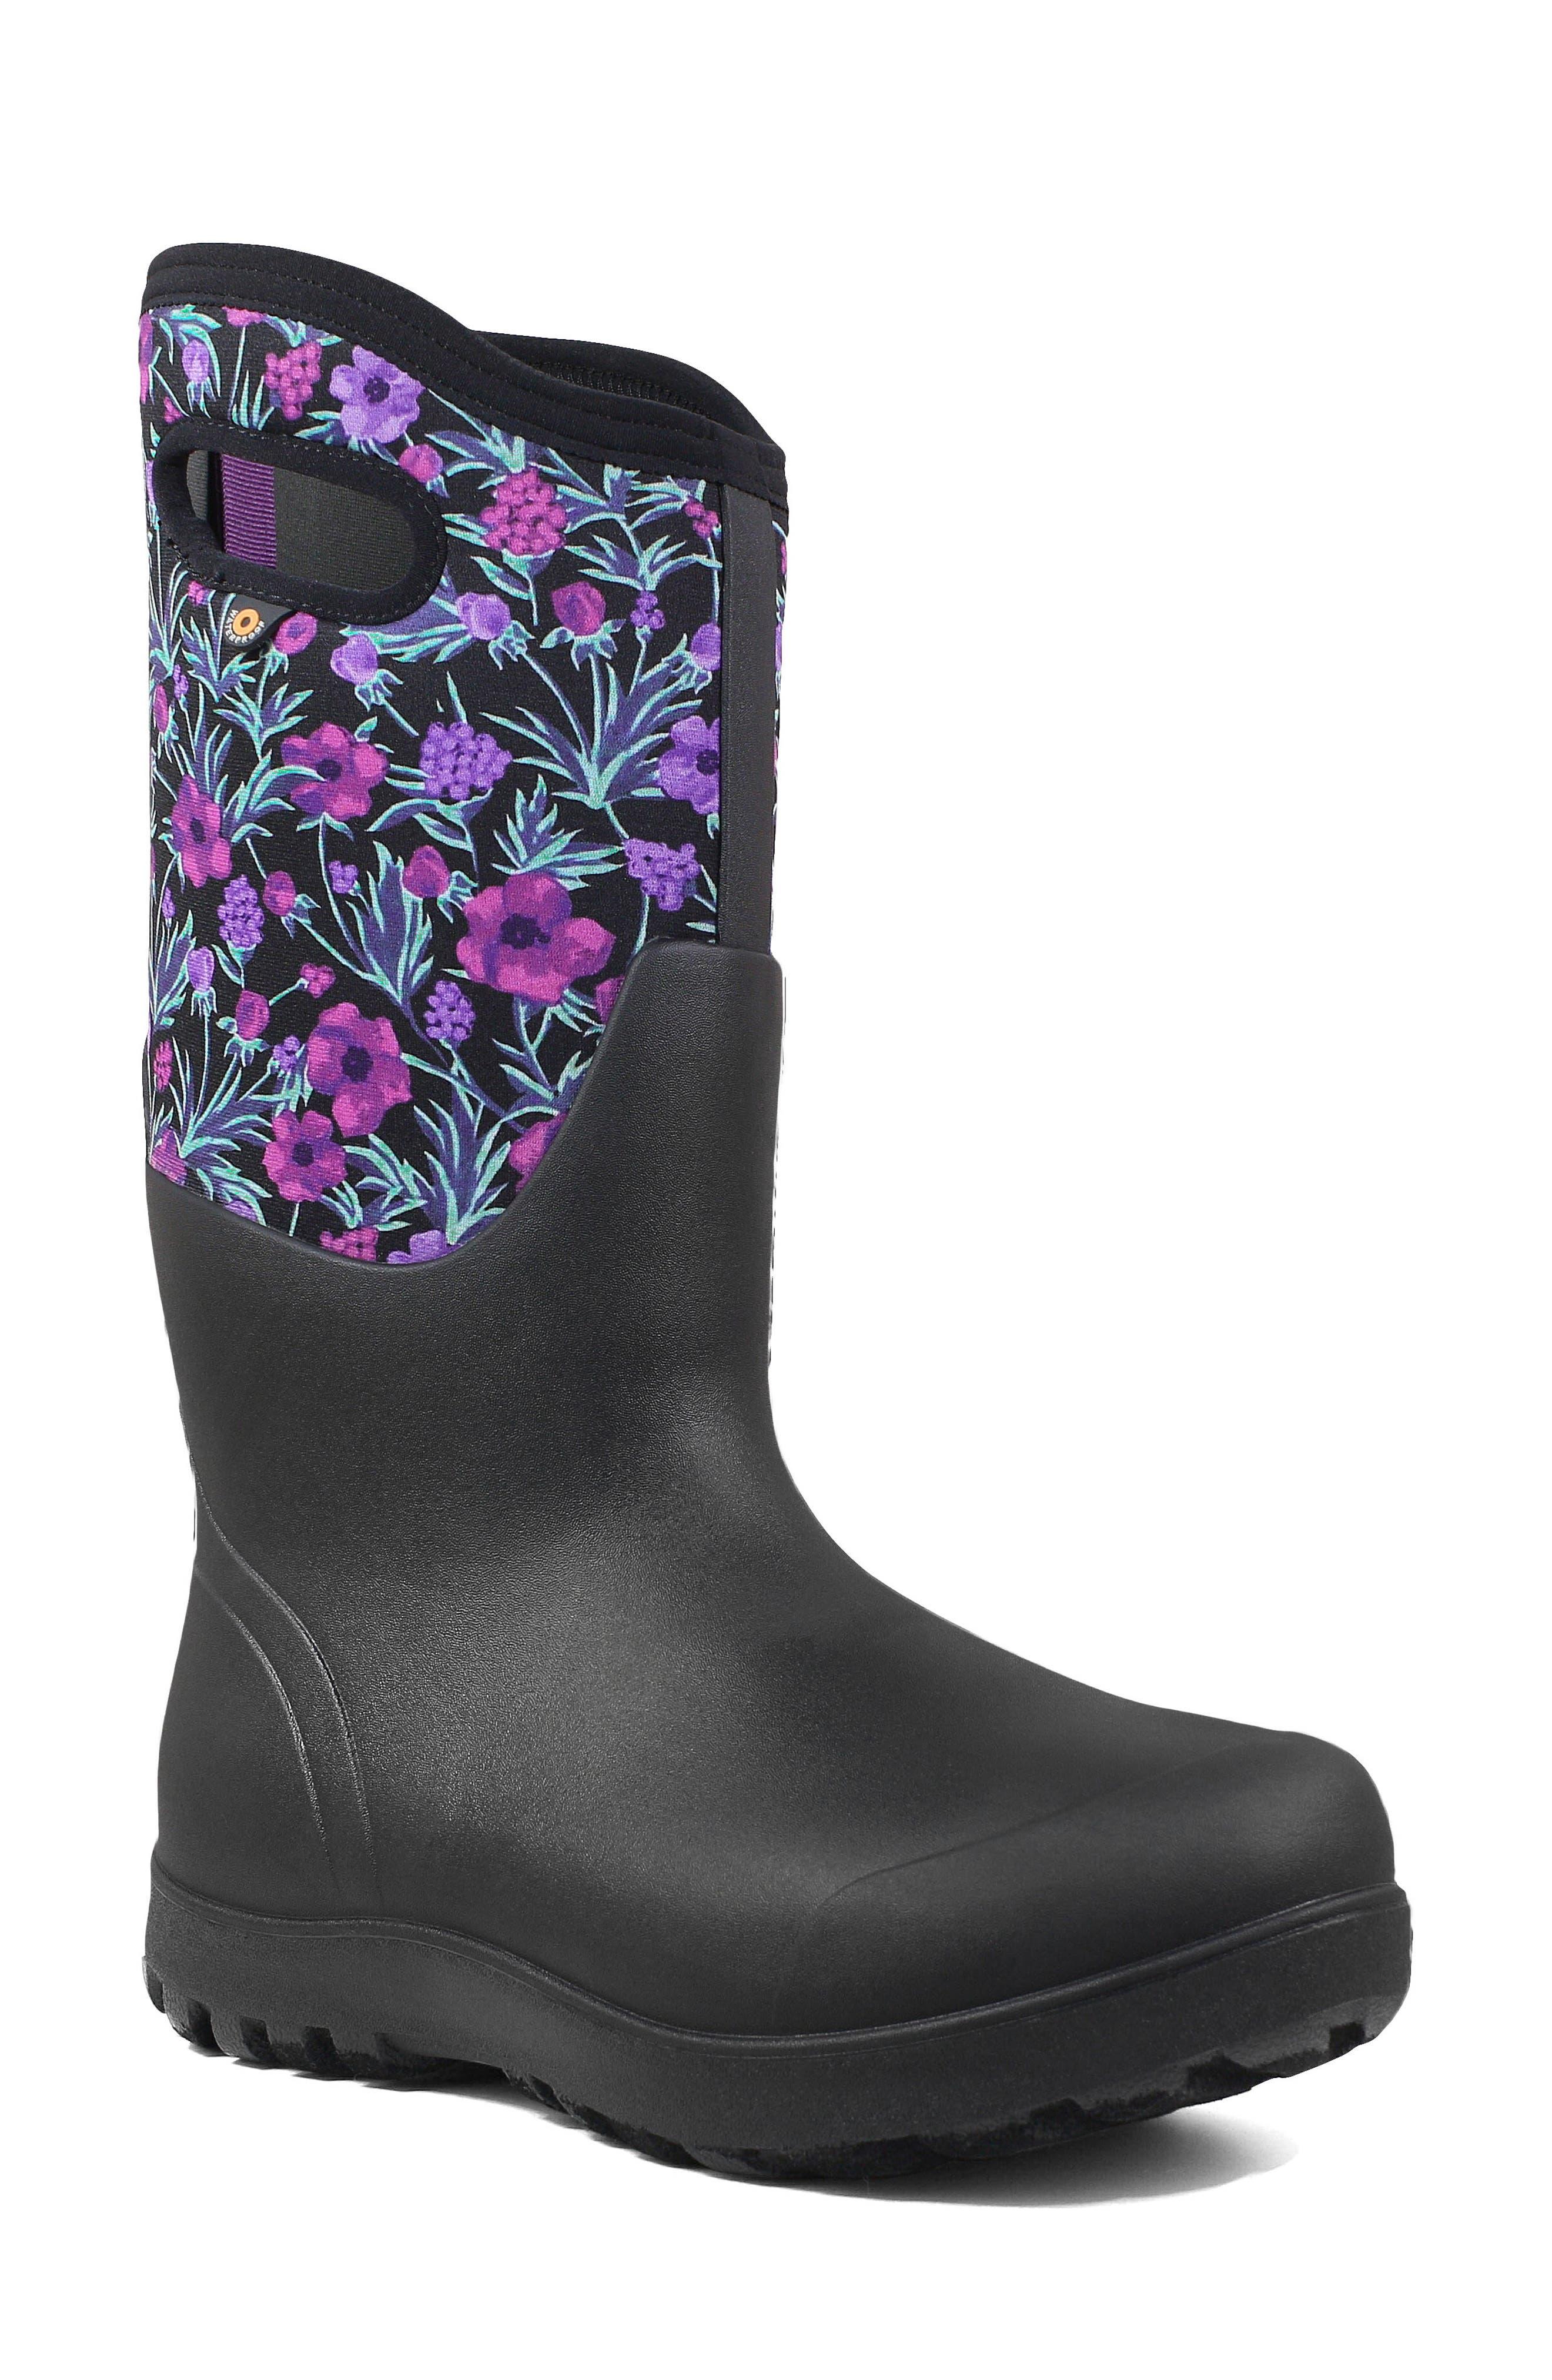 Neo Classic Tall Vine Floral Waterproof Rain Boot